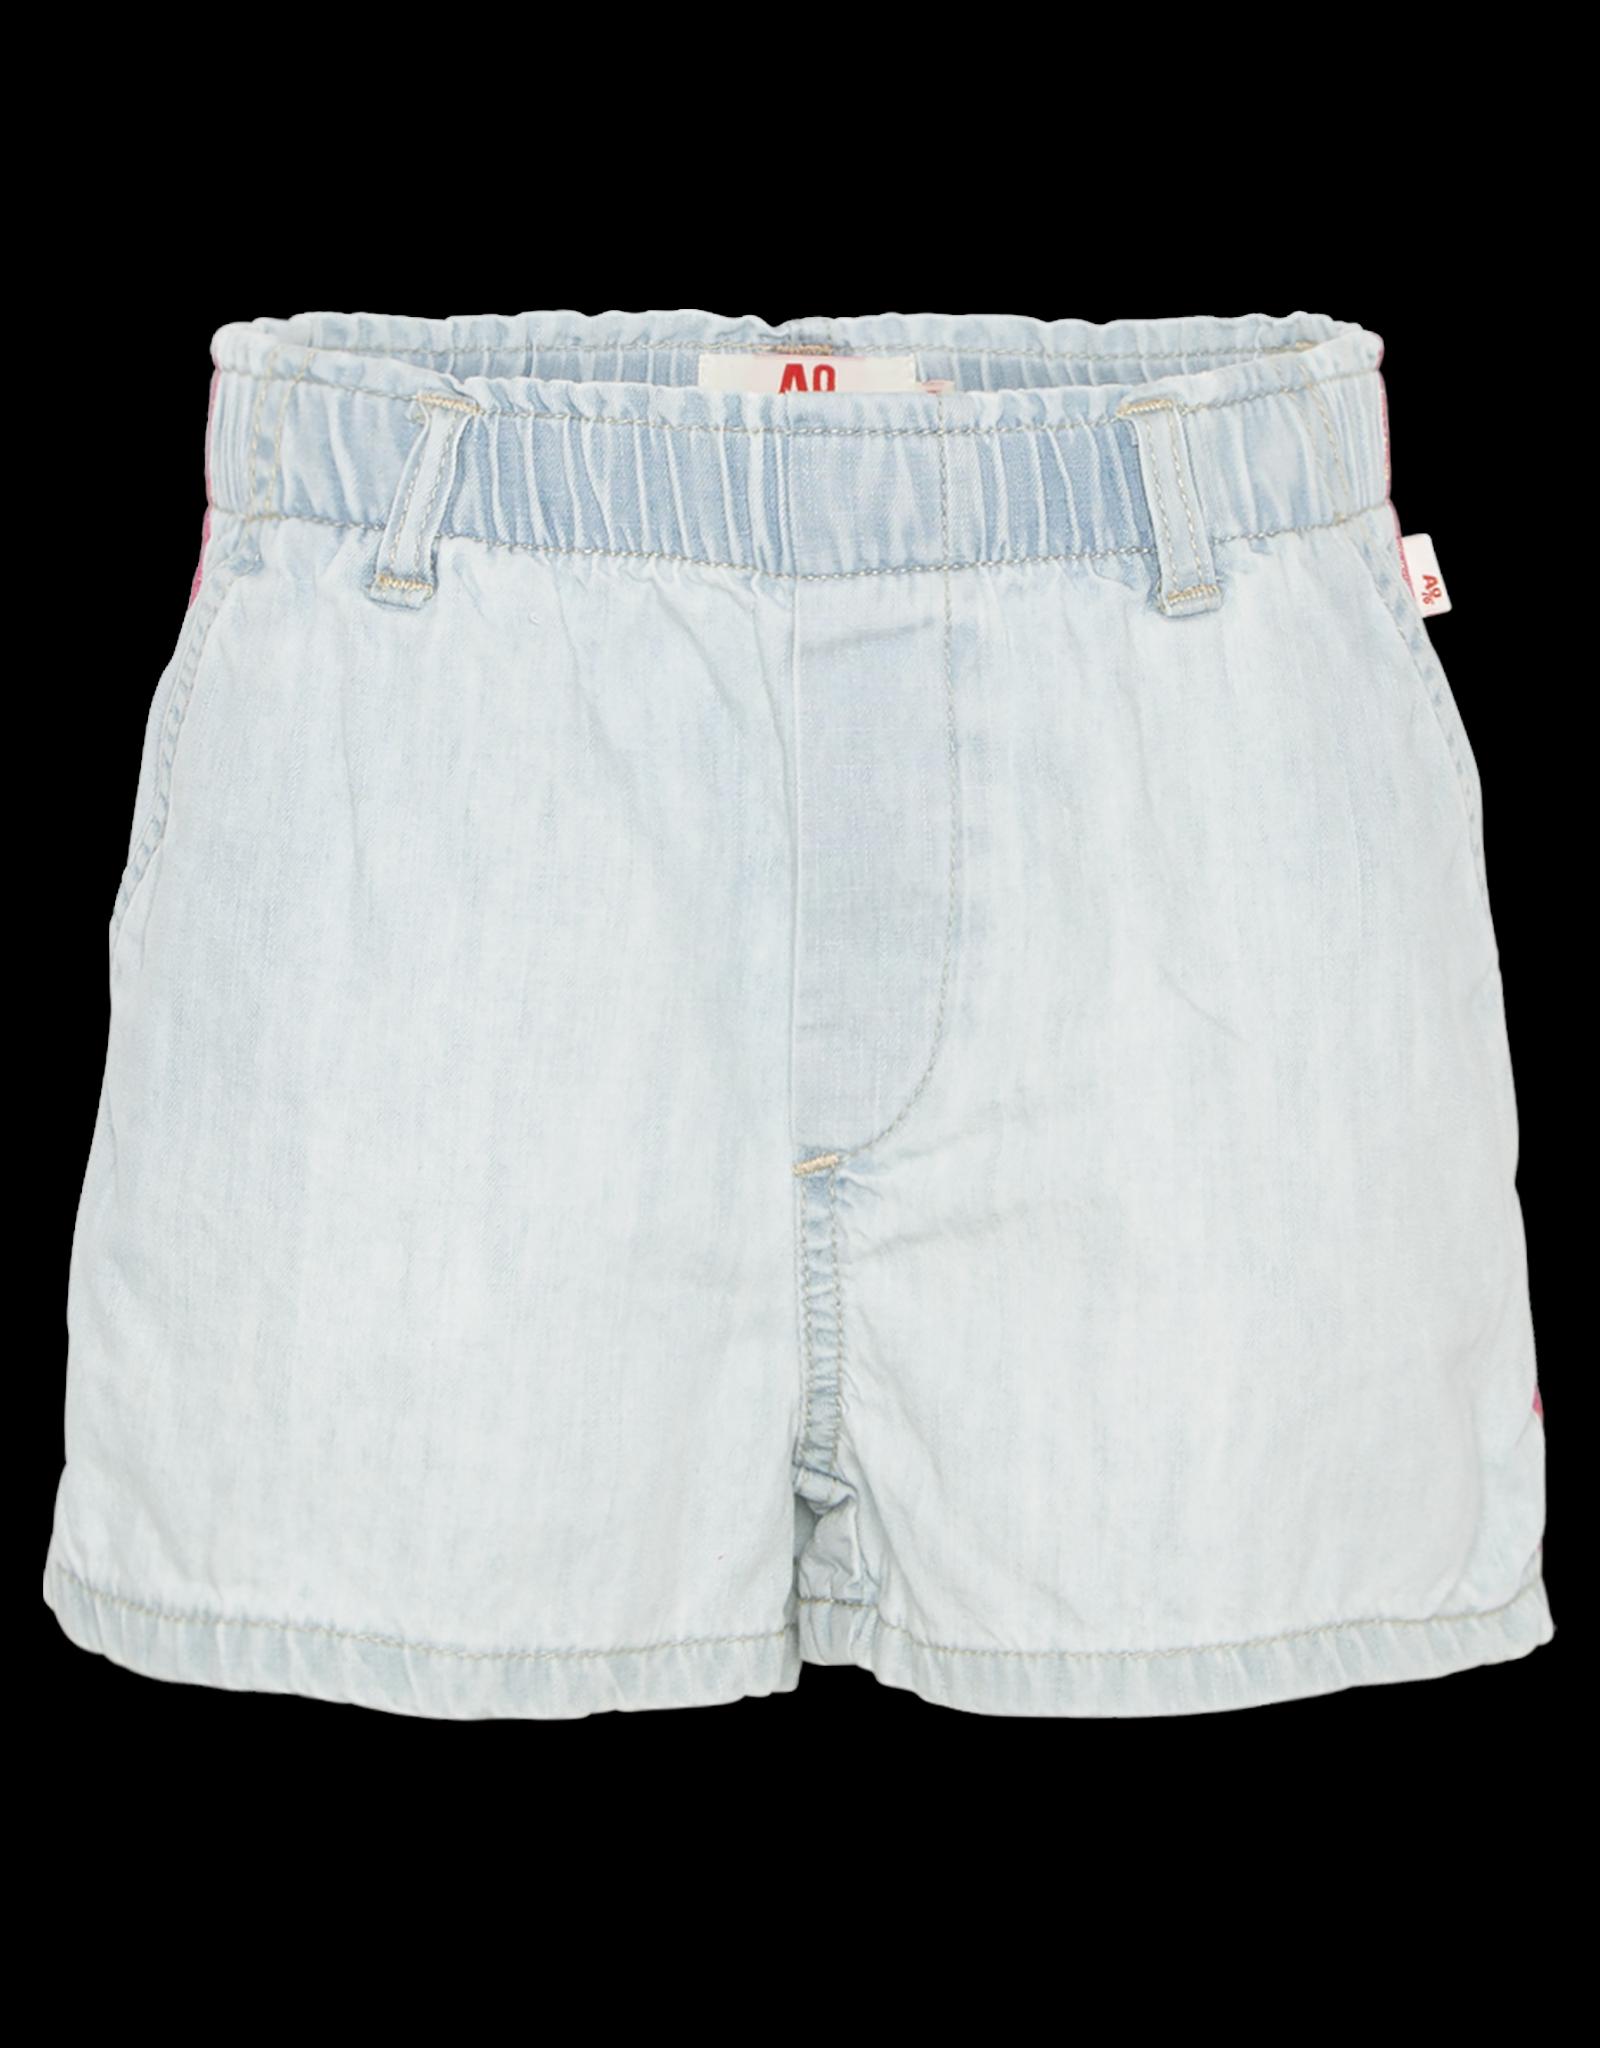 AMERICAN OUTFITTERS Ao76 Carla Bleach Shorts